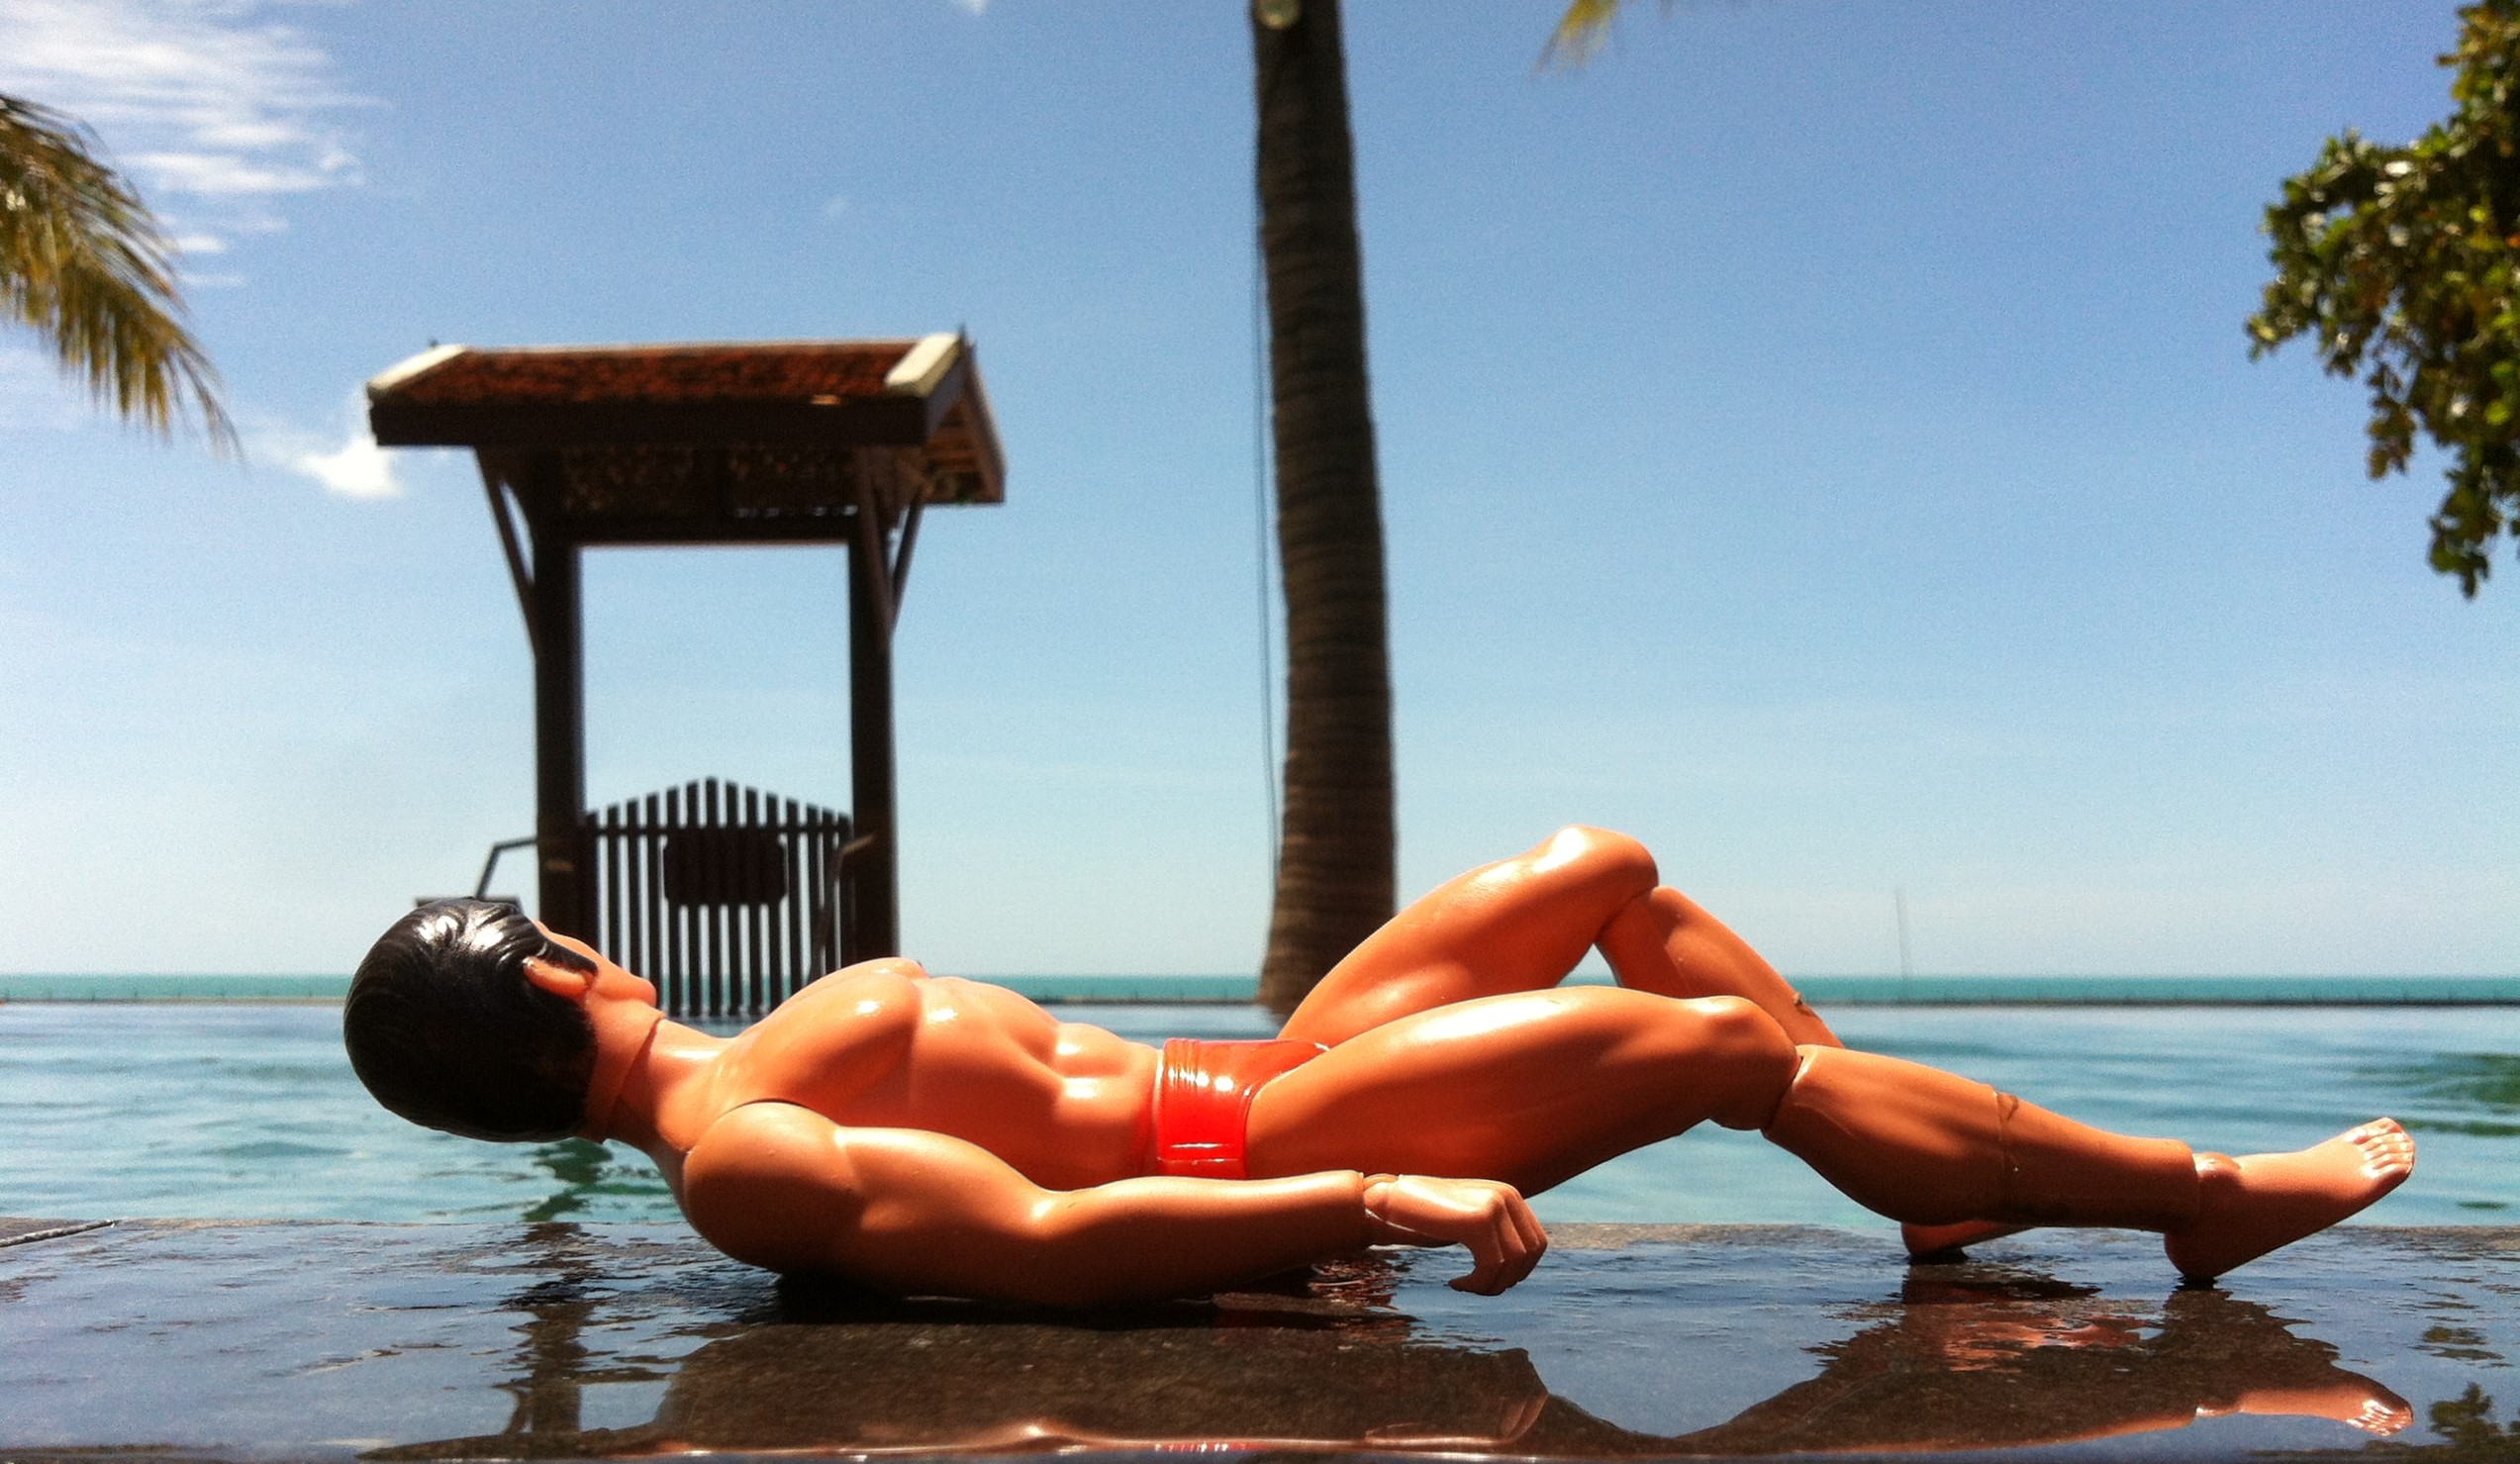 013 - sunbathing